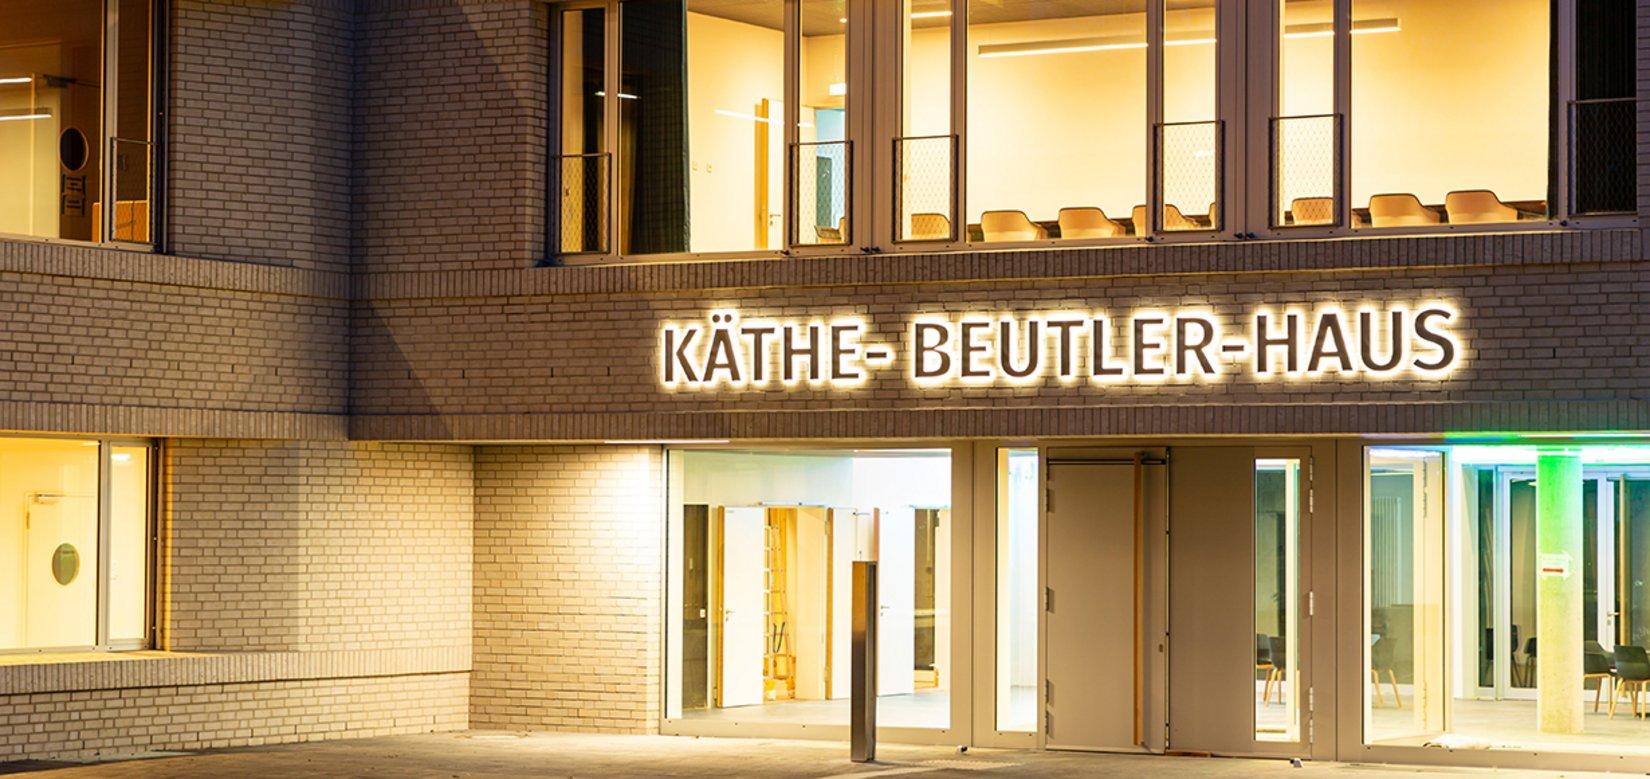 Patient-oriented research in the Käthe-Beutler-Haus